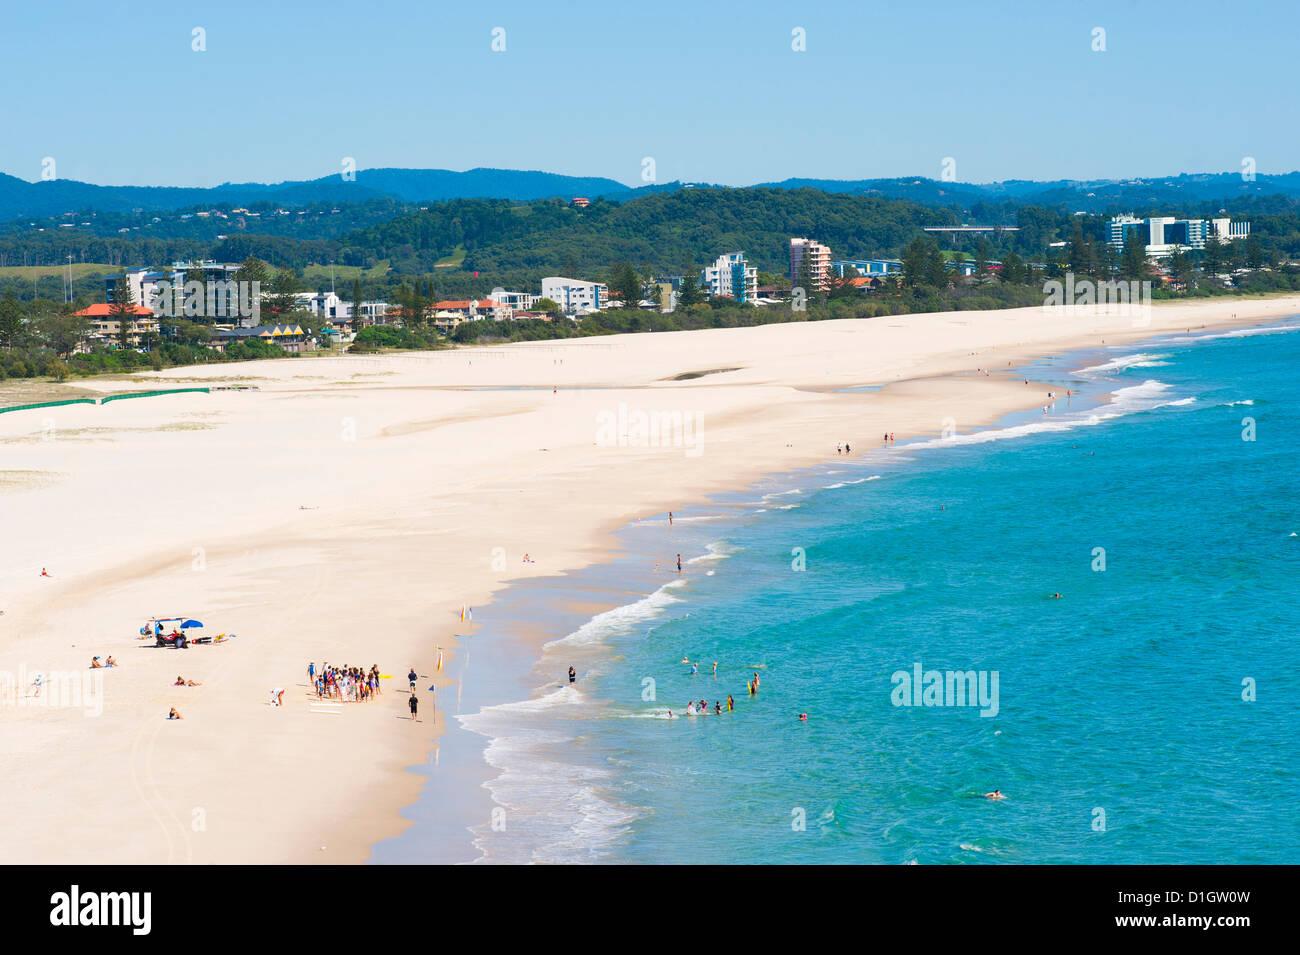 Surf school on Coolangatta Beach, Gold Coast, Queensland, Australia, Pacific - Stock Image